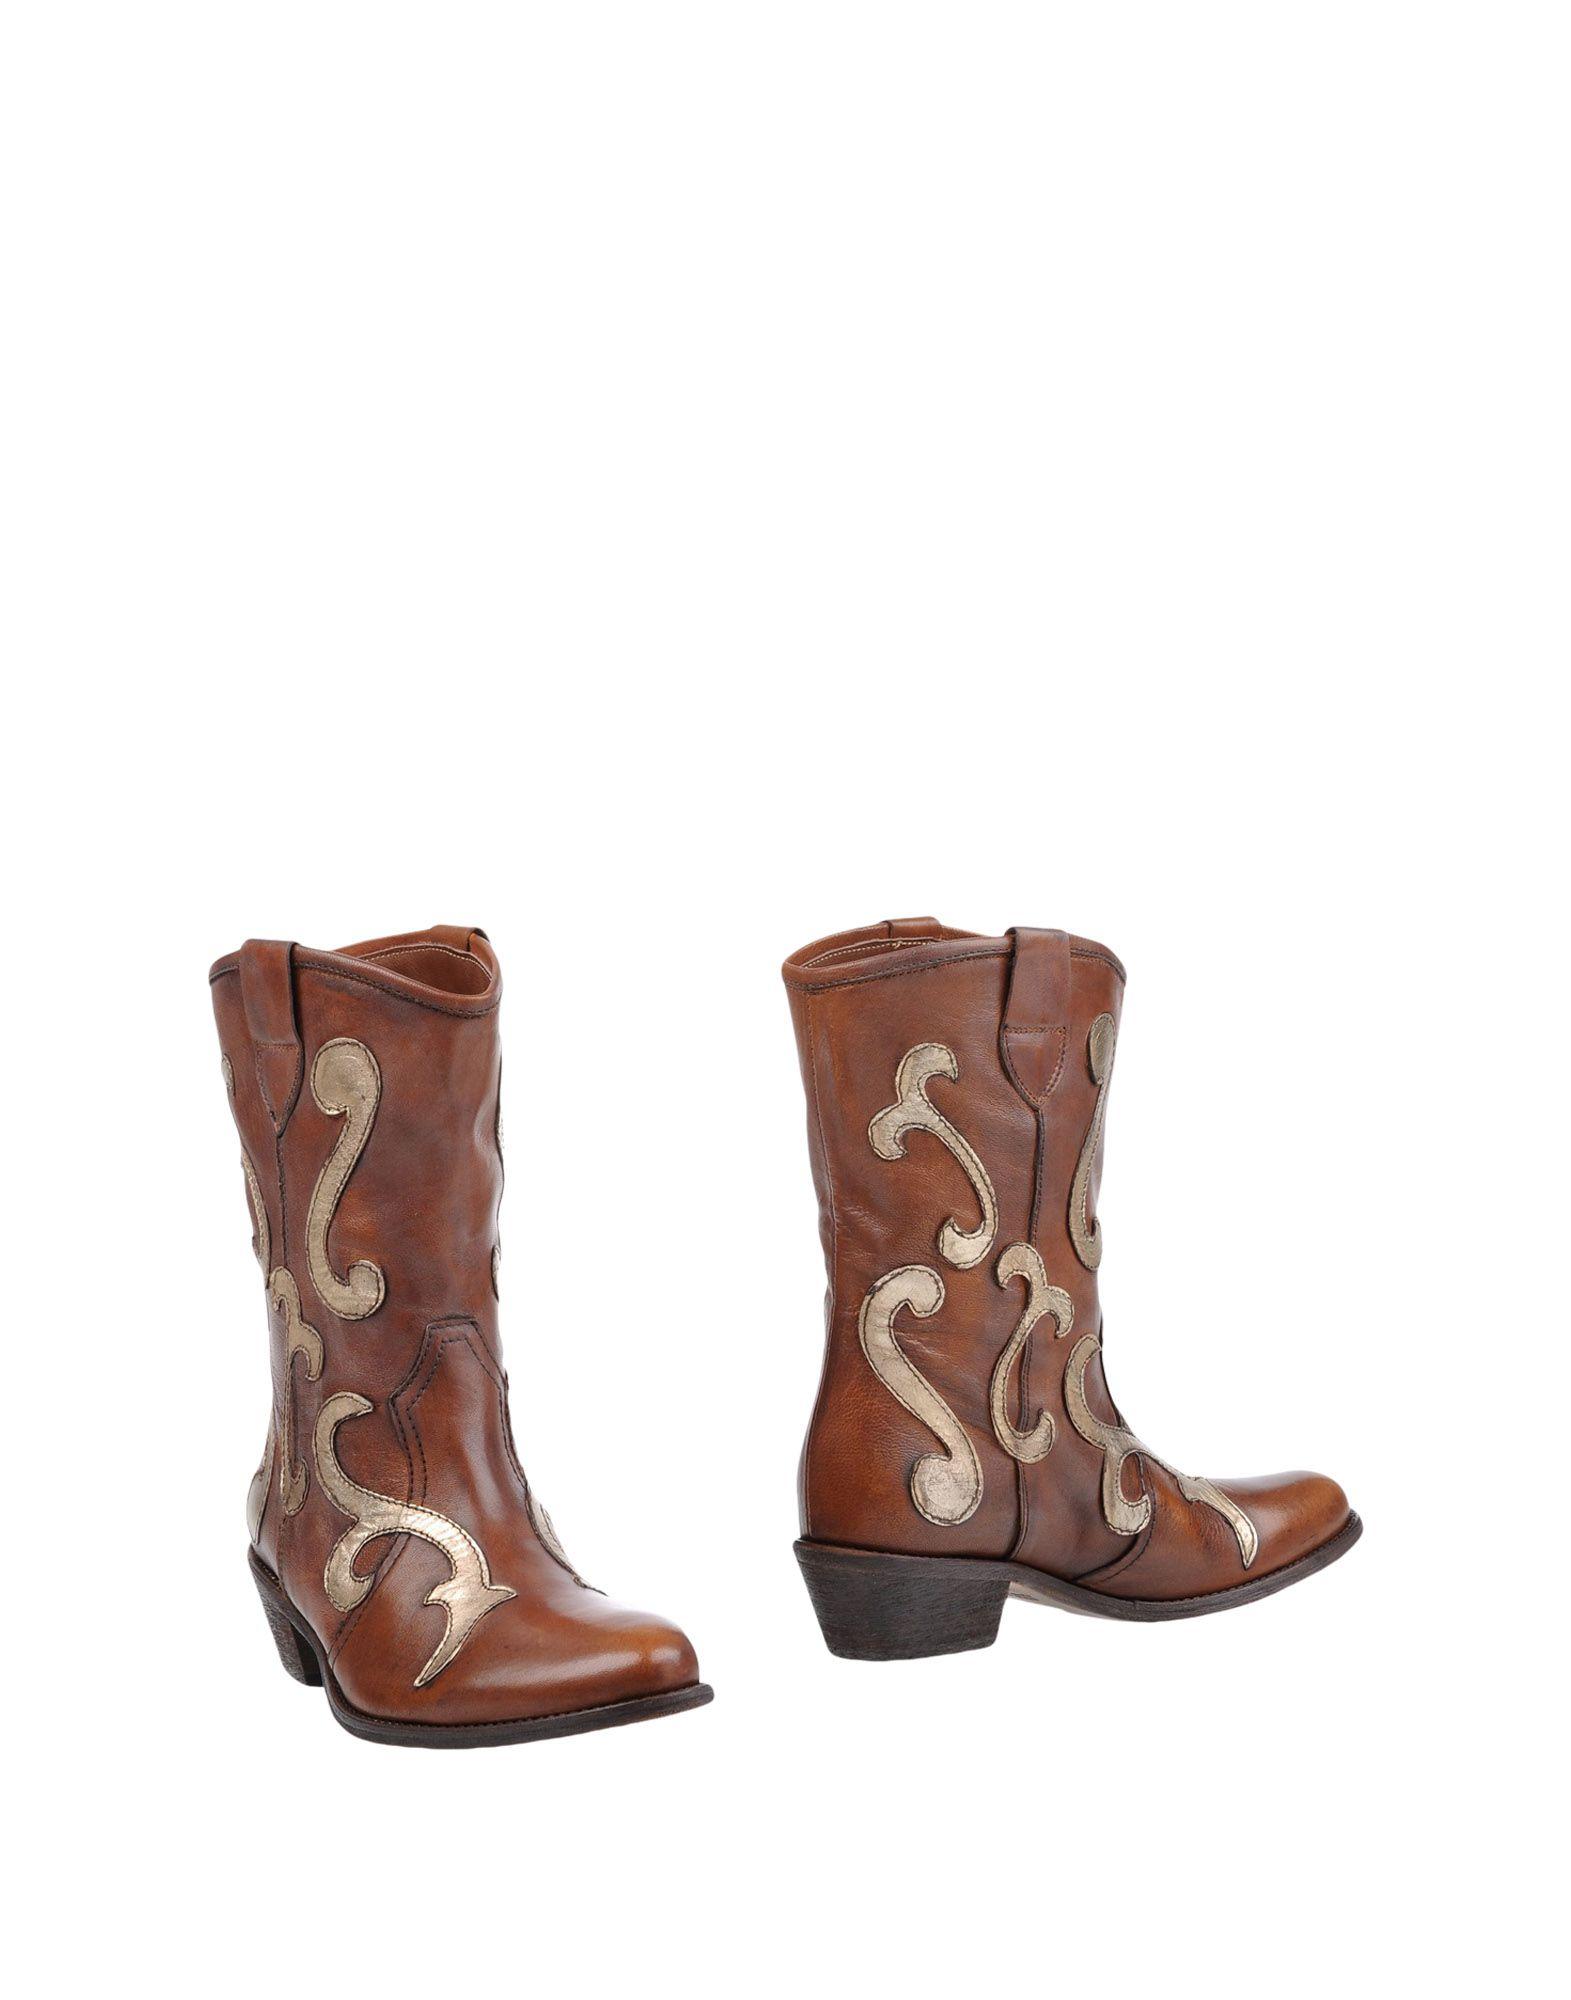 Marco Venezia Ankle Boot - Women Marco Venezia  Ankle Boots online on  Venezia Australia - 11363248EF 7727c4